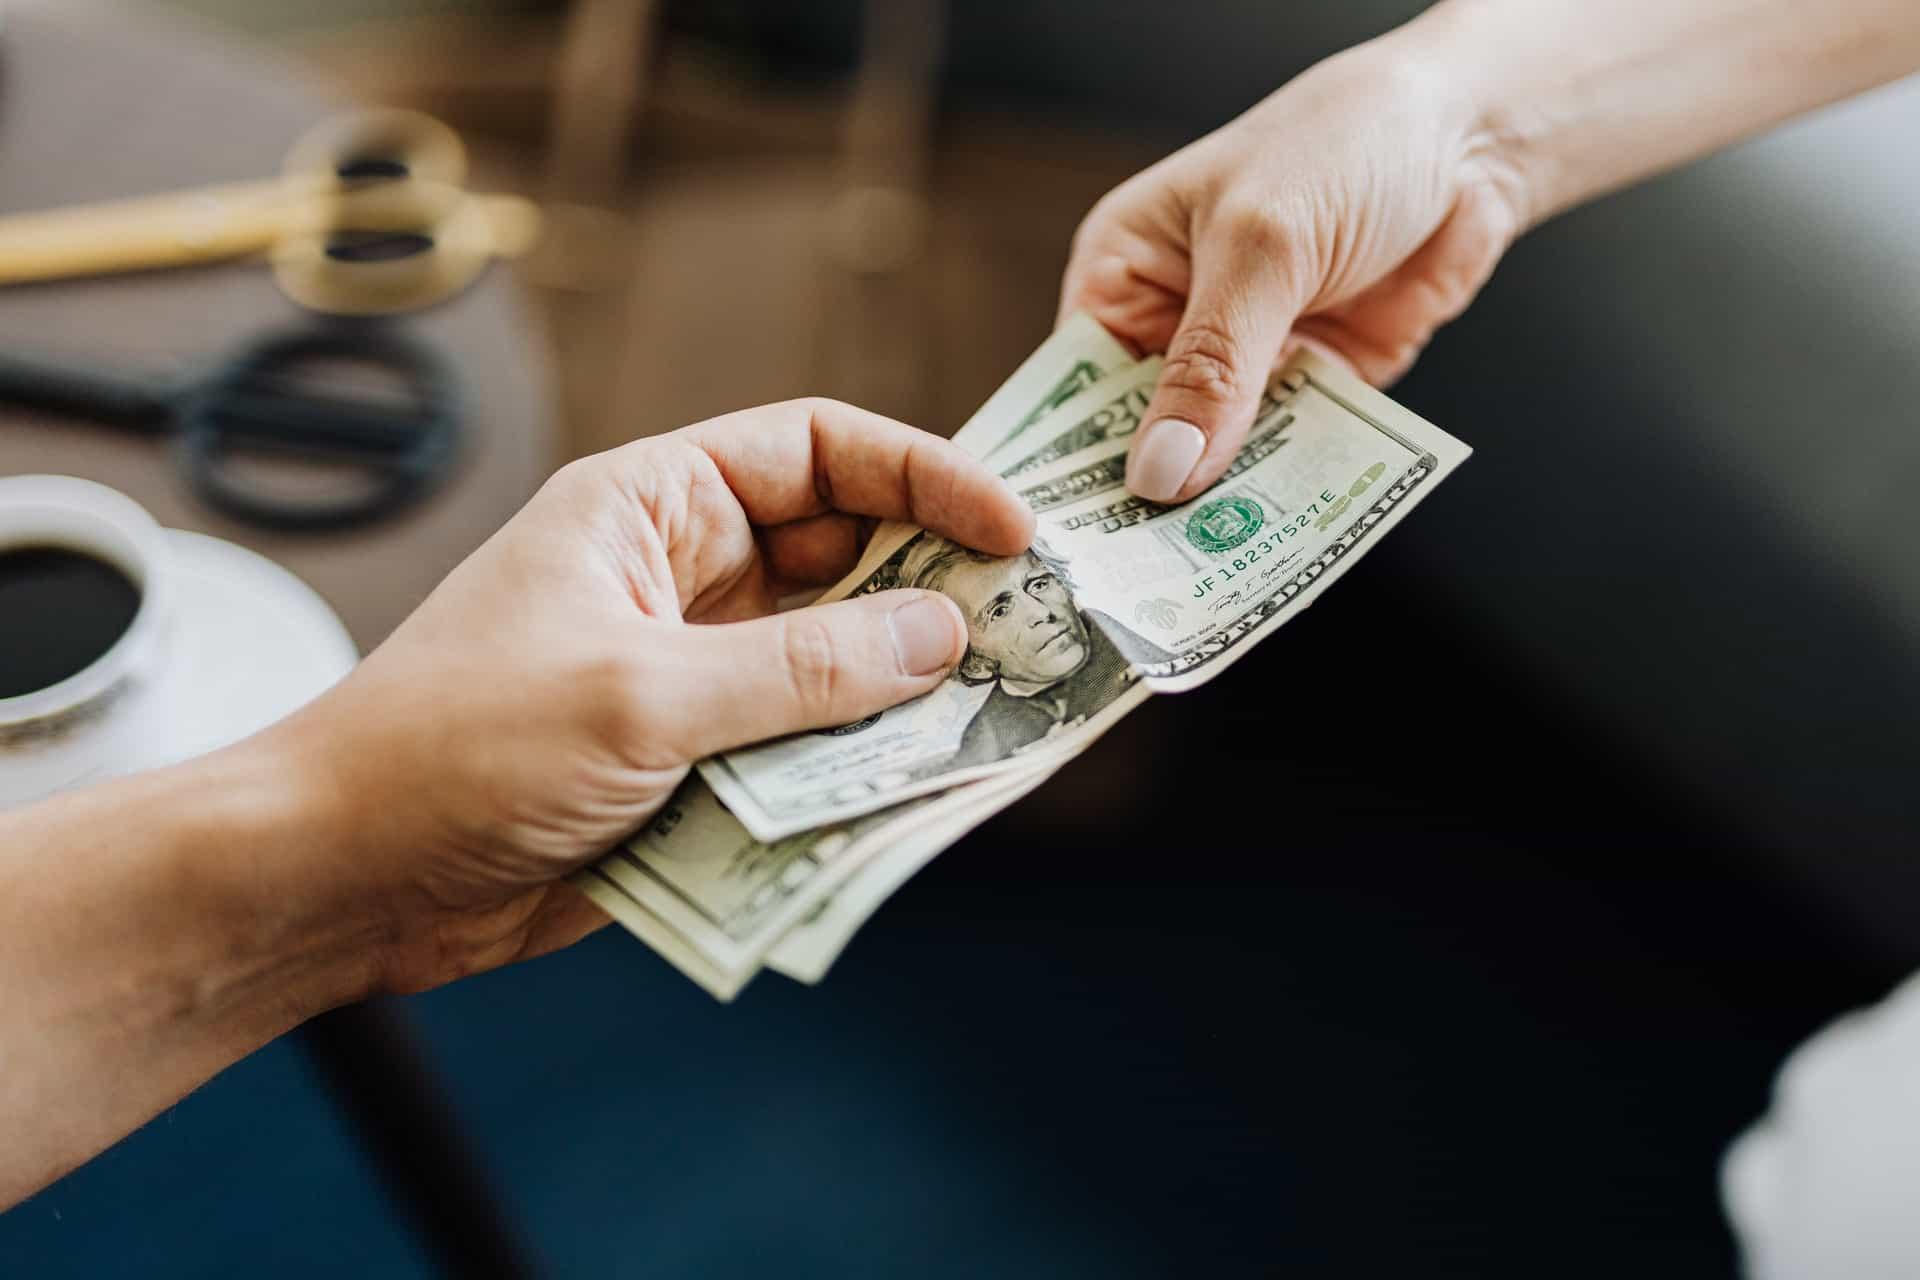 People passing around money